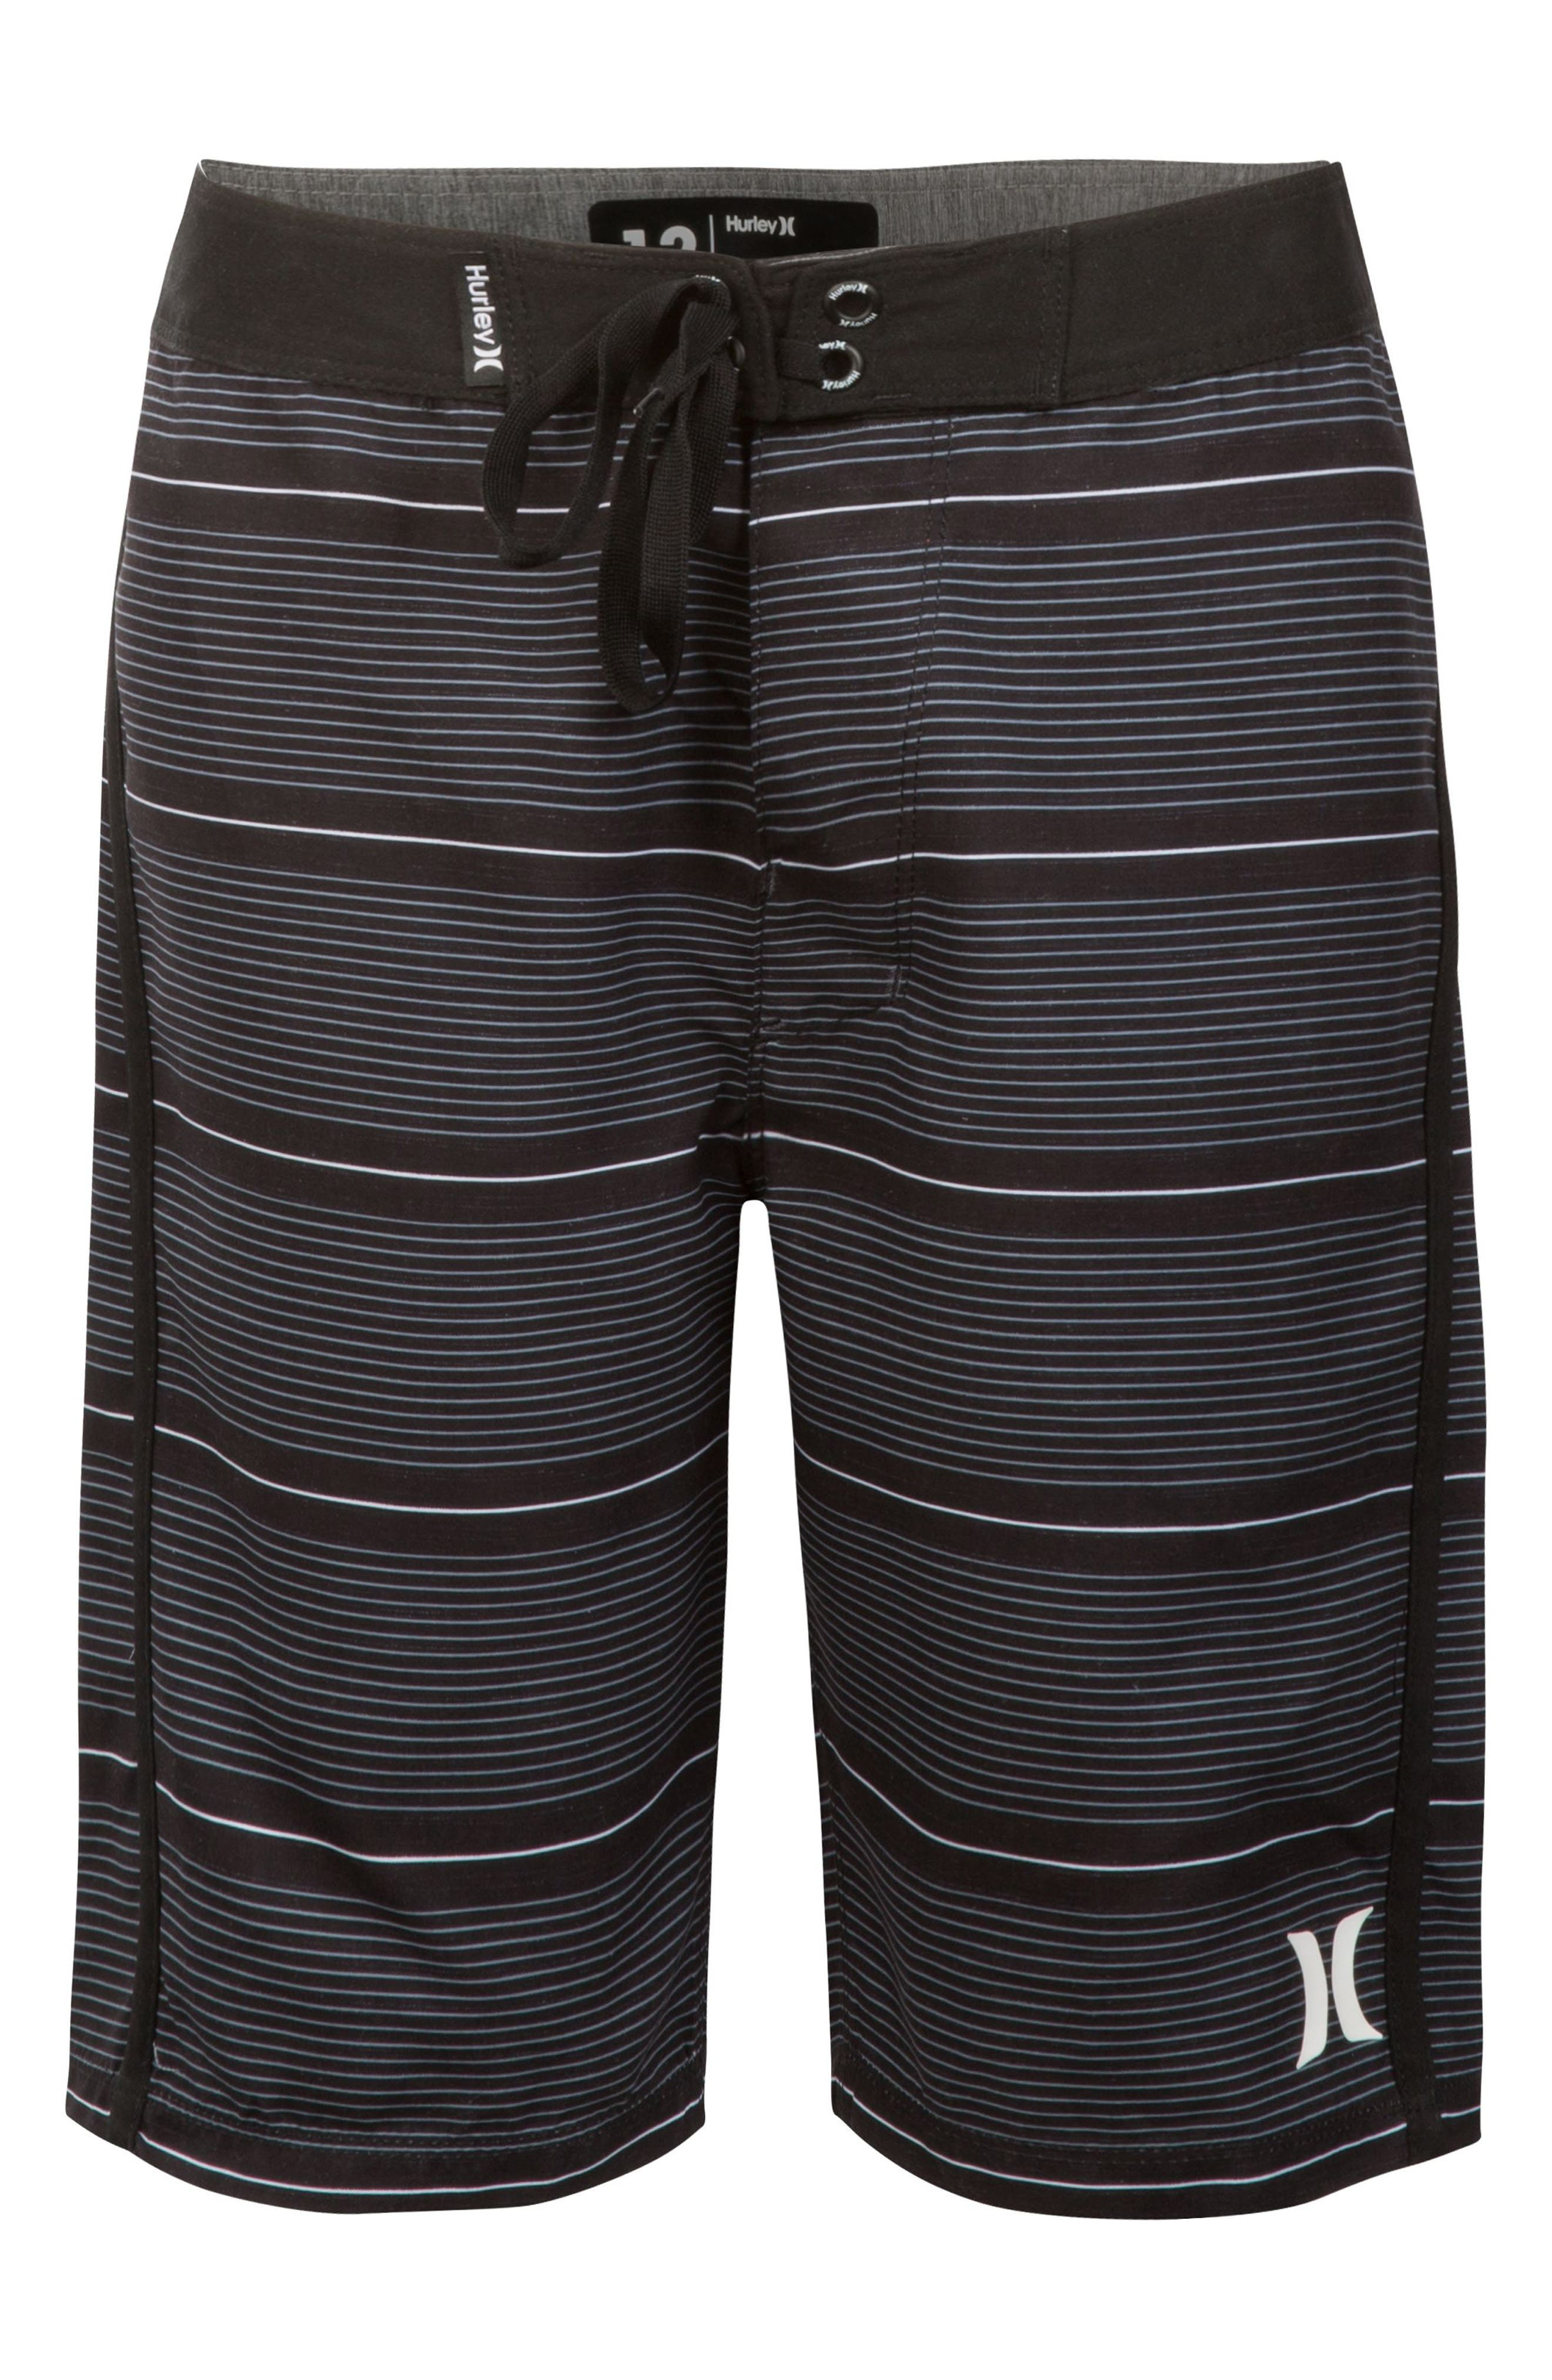 Shoreline Board Shorts,                             Main thumbnail 1, color,                             BLACK